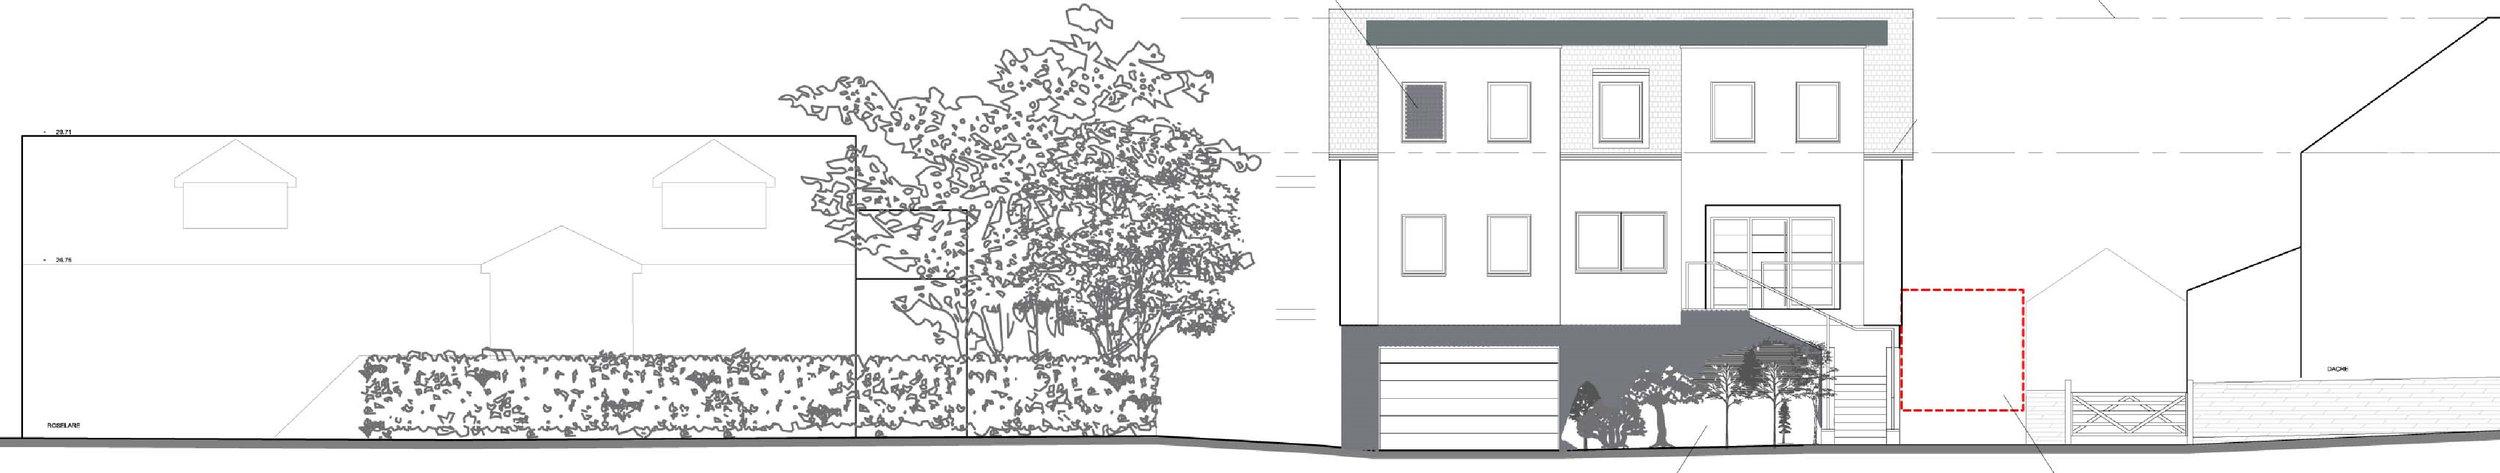 Collingham New Build - Visual Concept(Front)